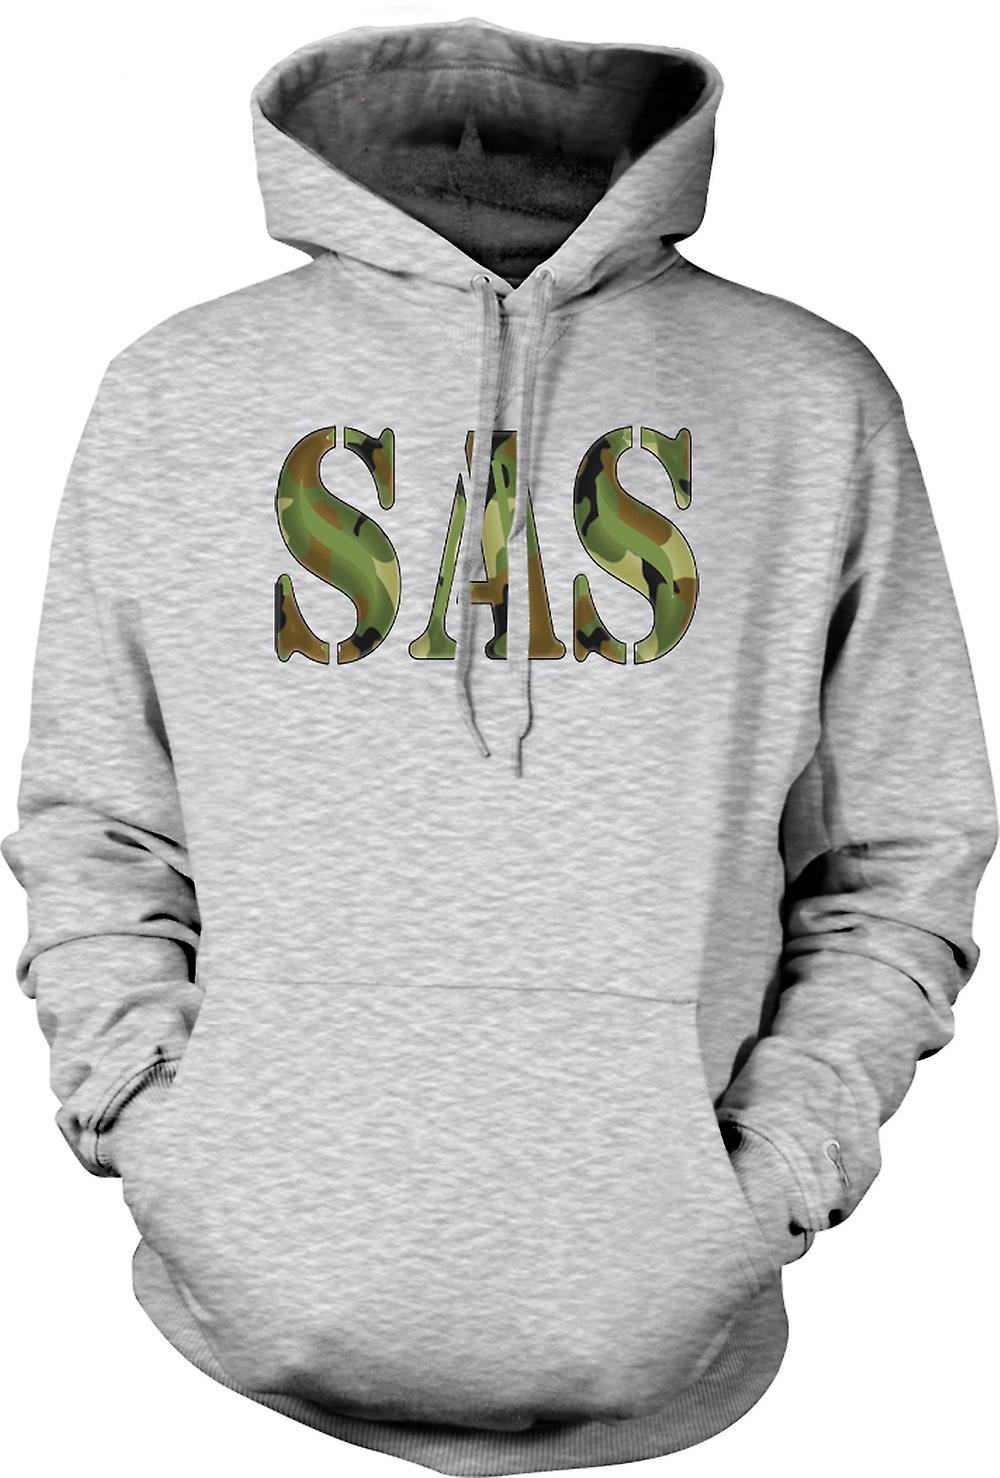 Mens Hoodie - SAS - Special Air Service